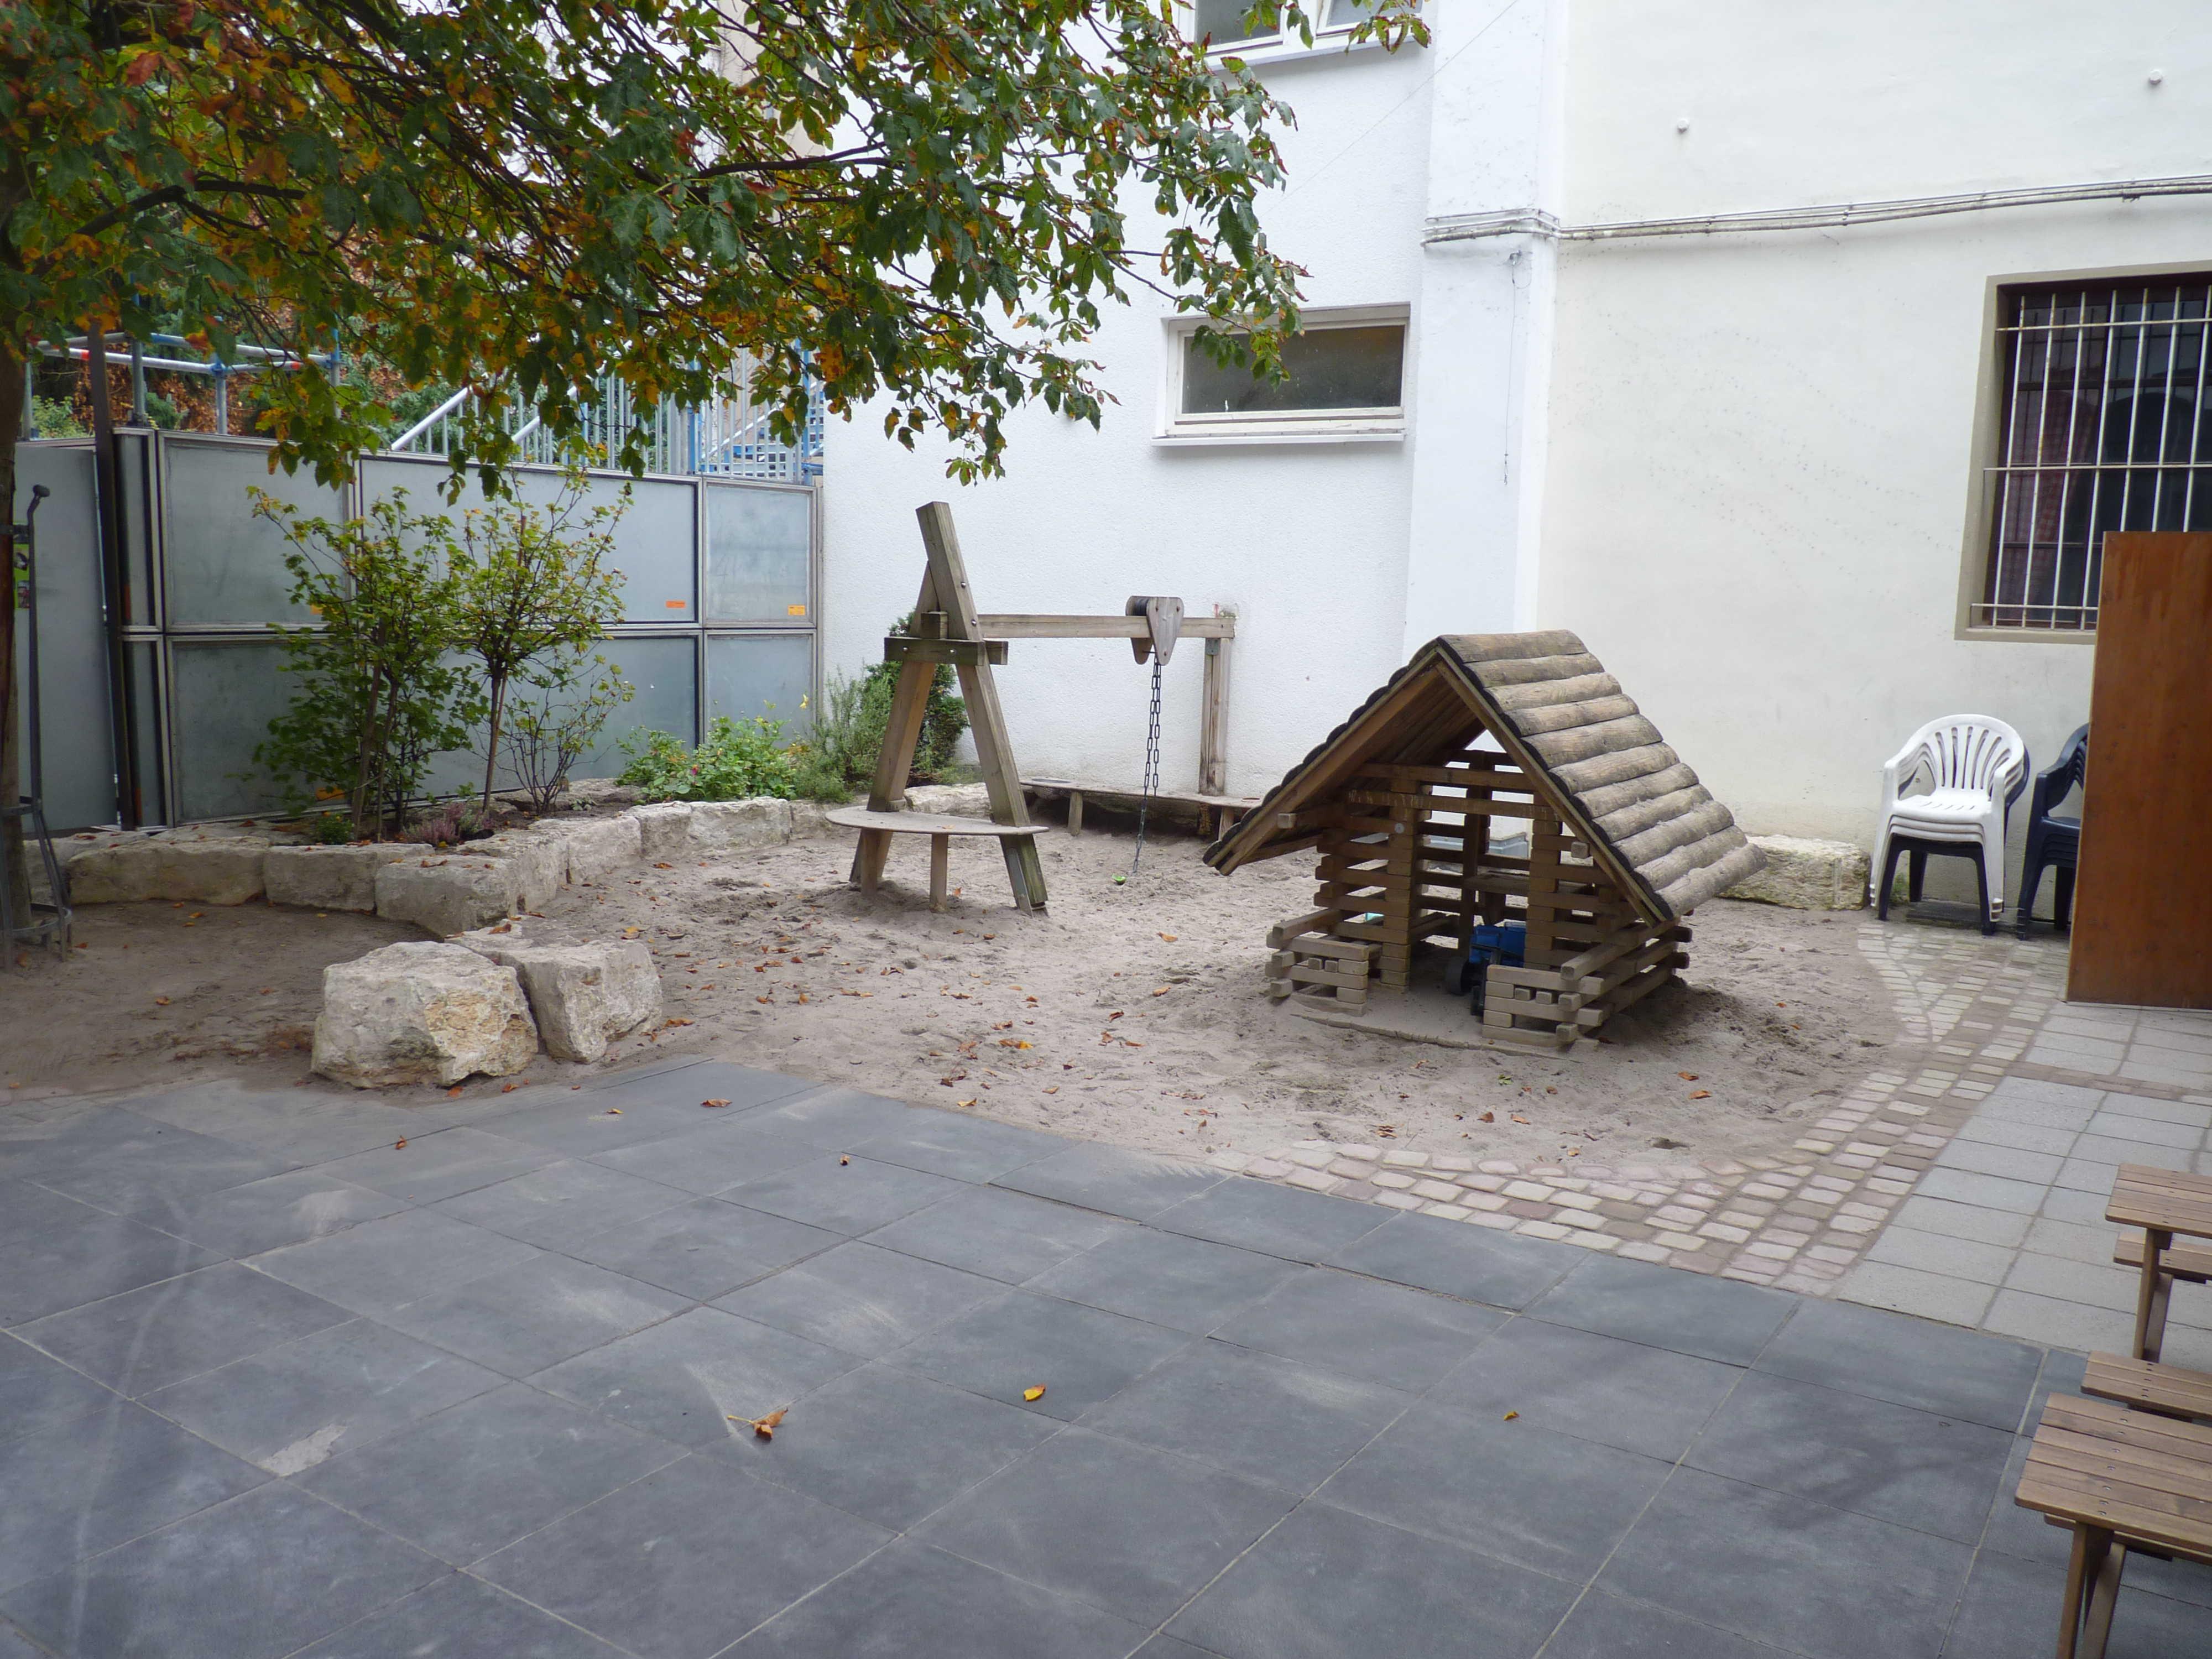 Spielhof